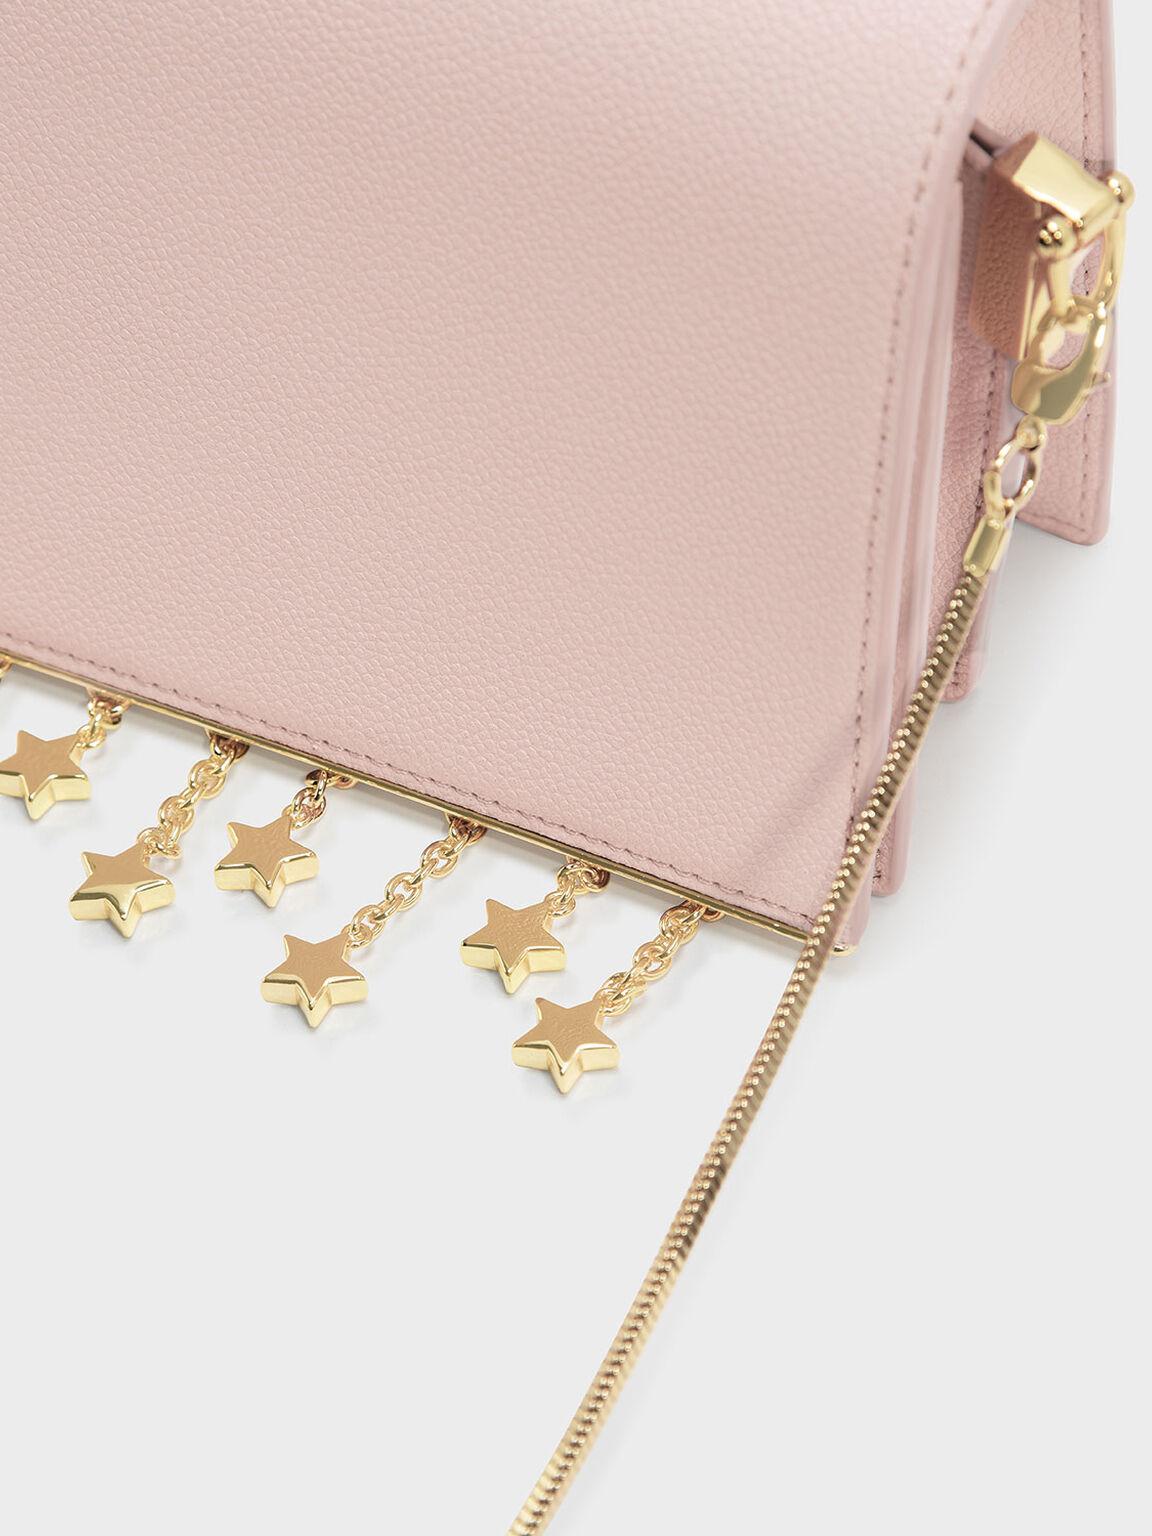 Charm Detail Crossbody Bag, Pink, hi-res